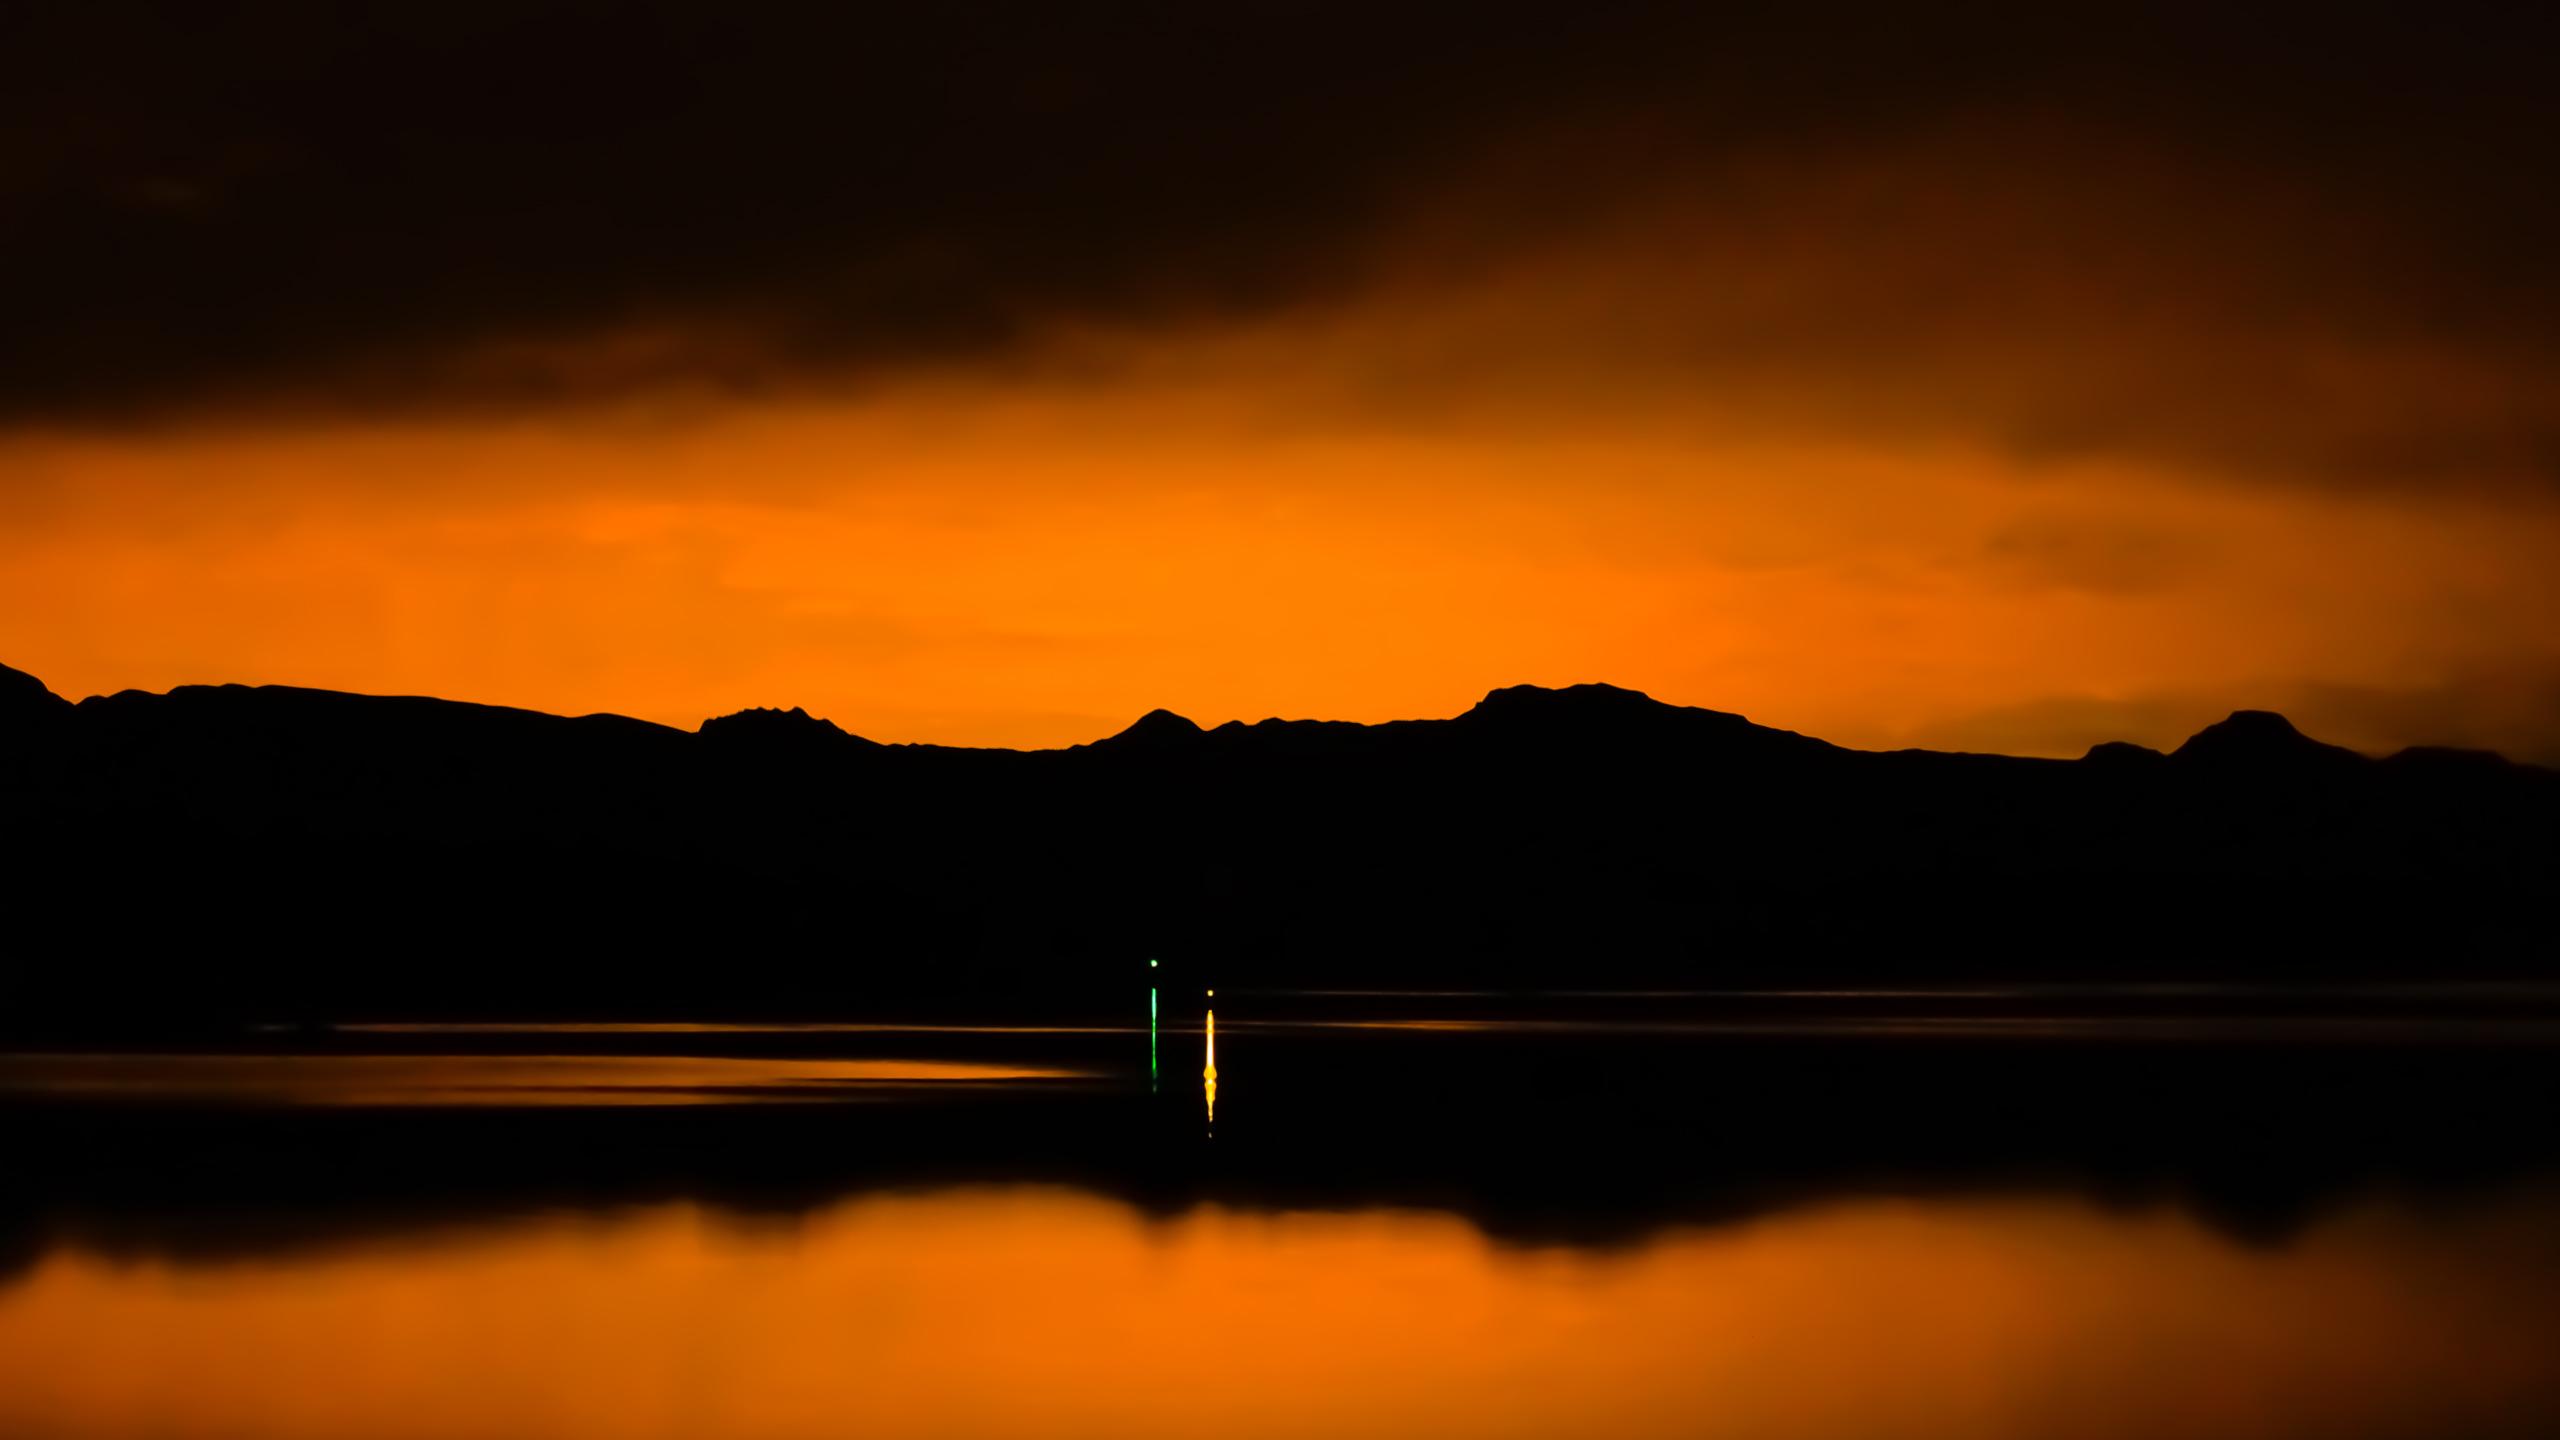 orange_night_wallpaper_2560x1440